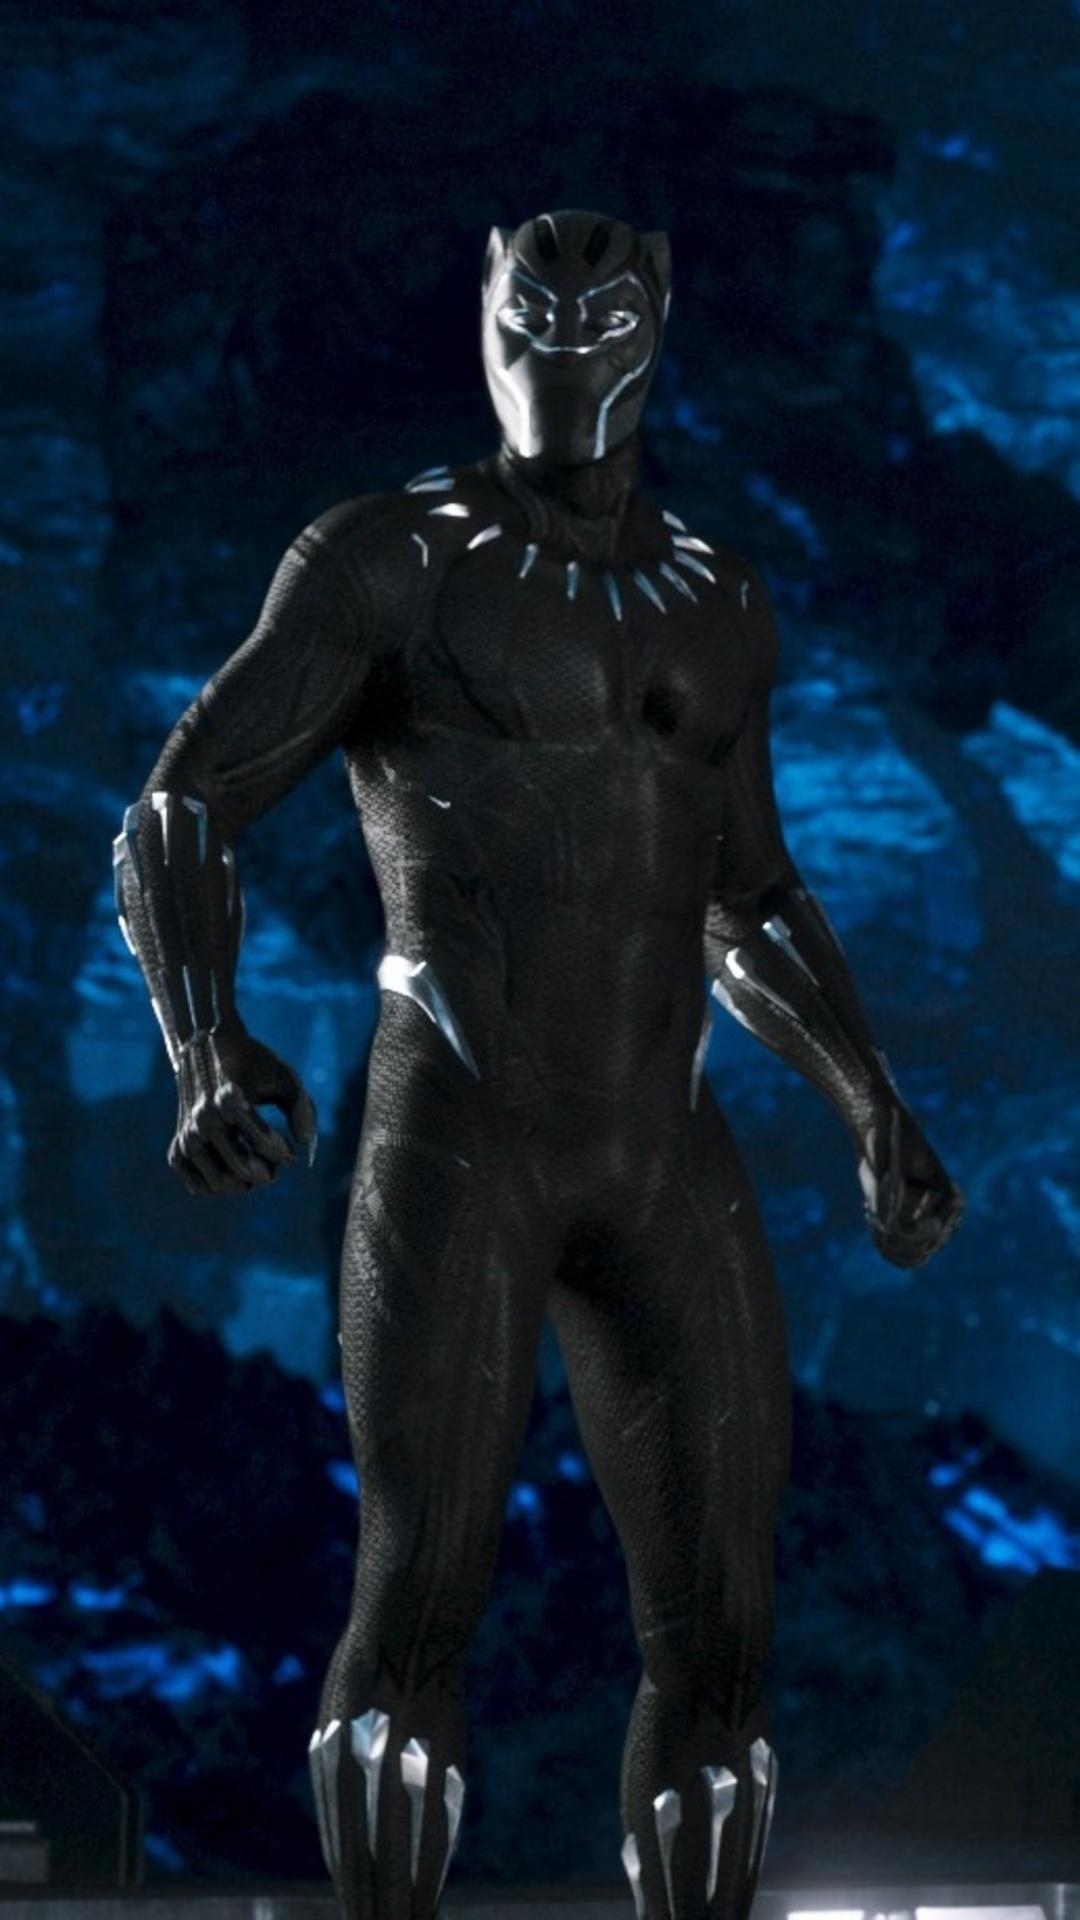 1080x1920 Marvel Black Panther Movie 2018 Iphone 7 6s 6 Plus Pixel